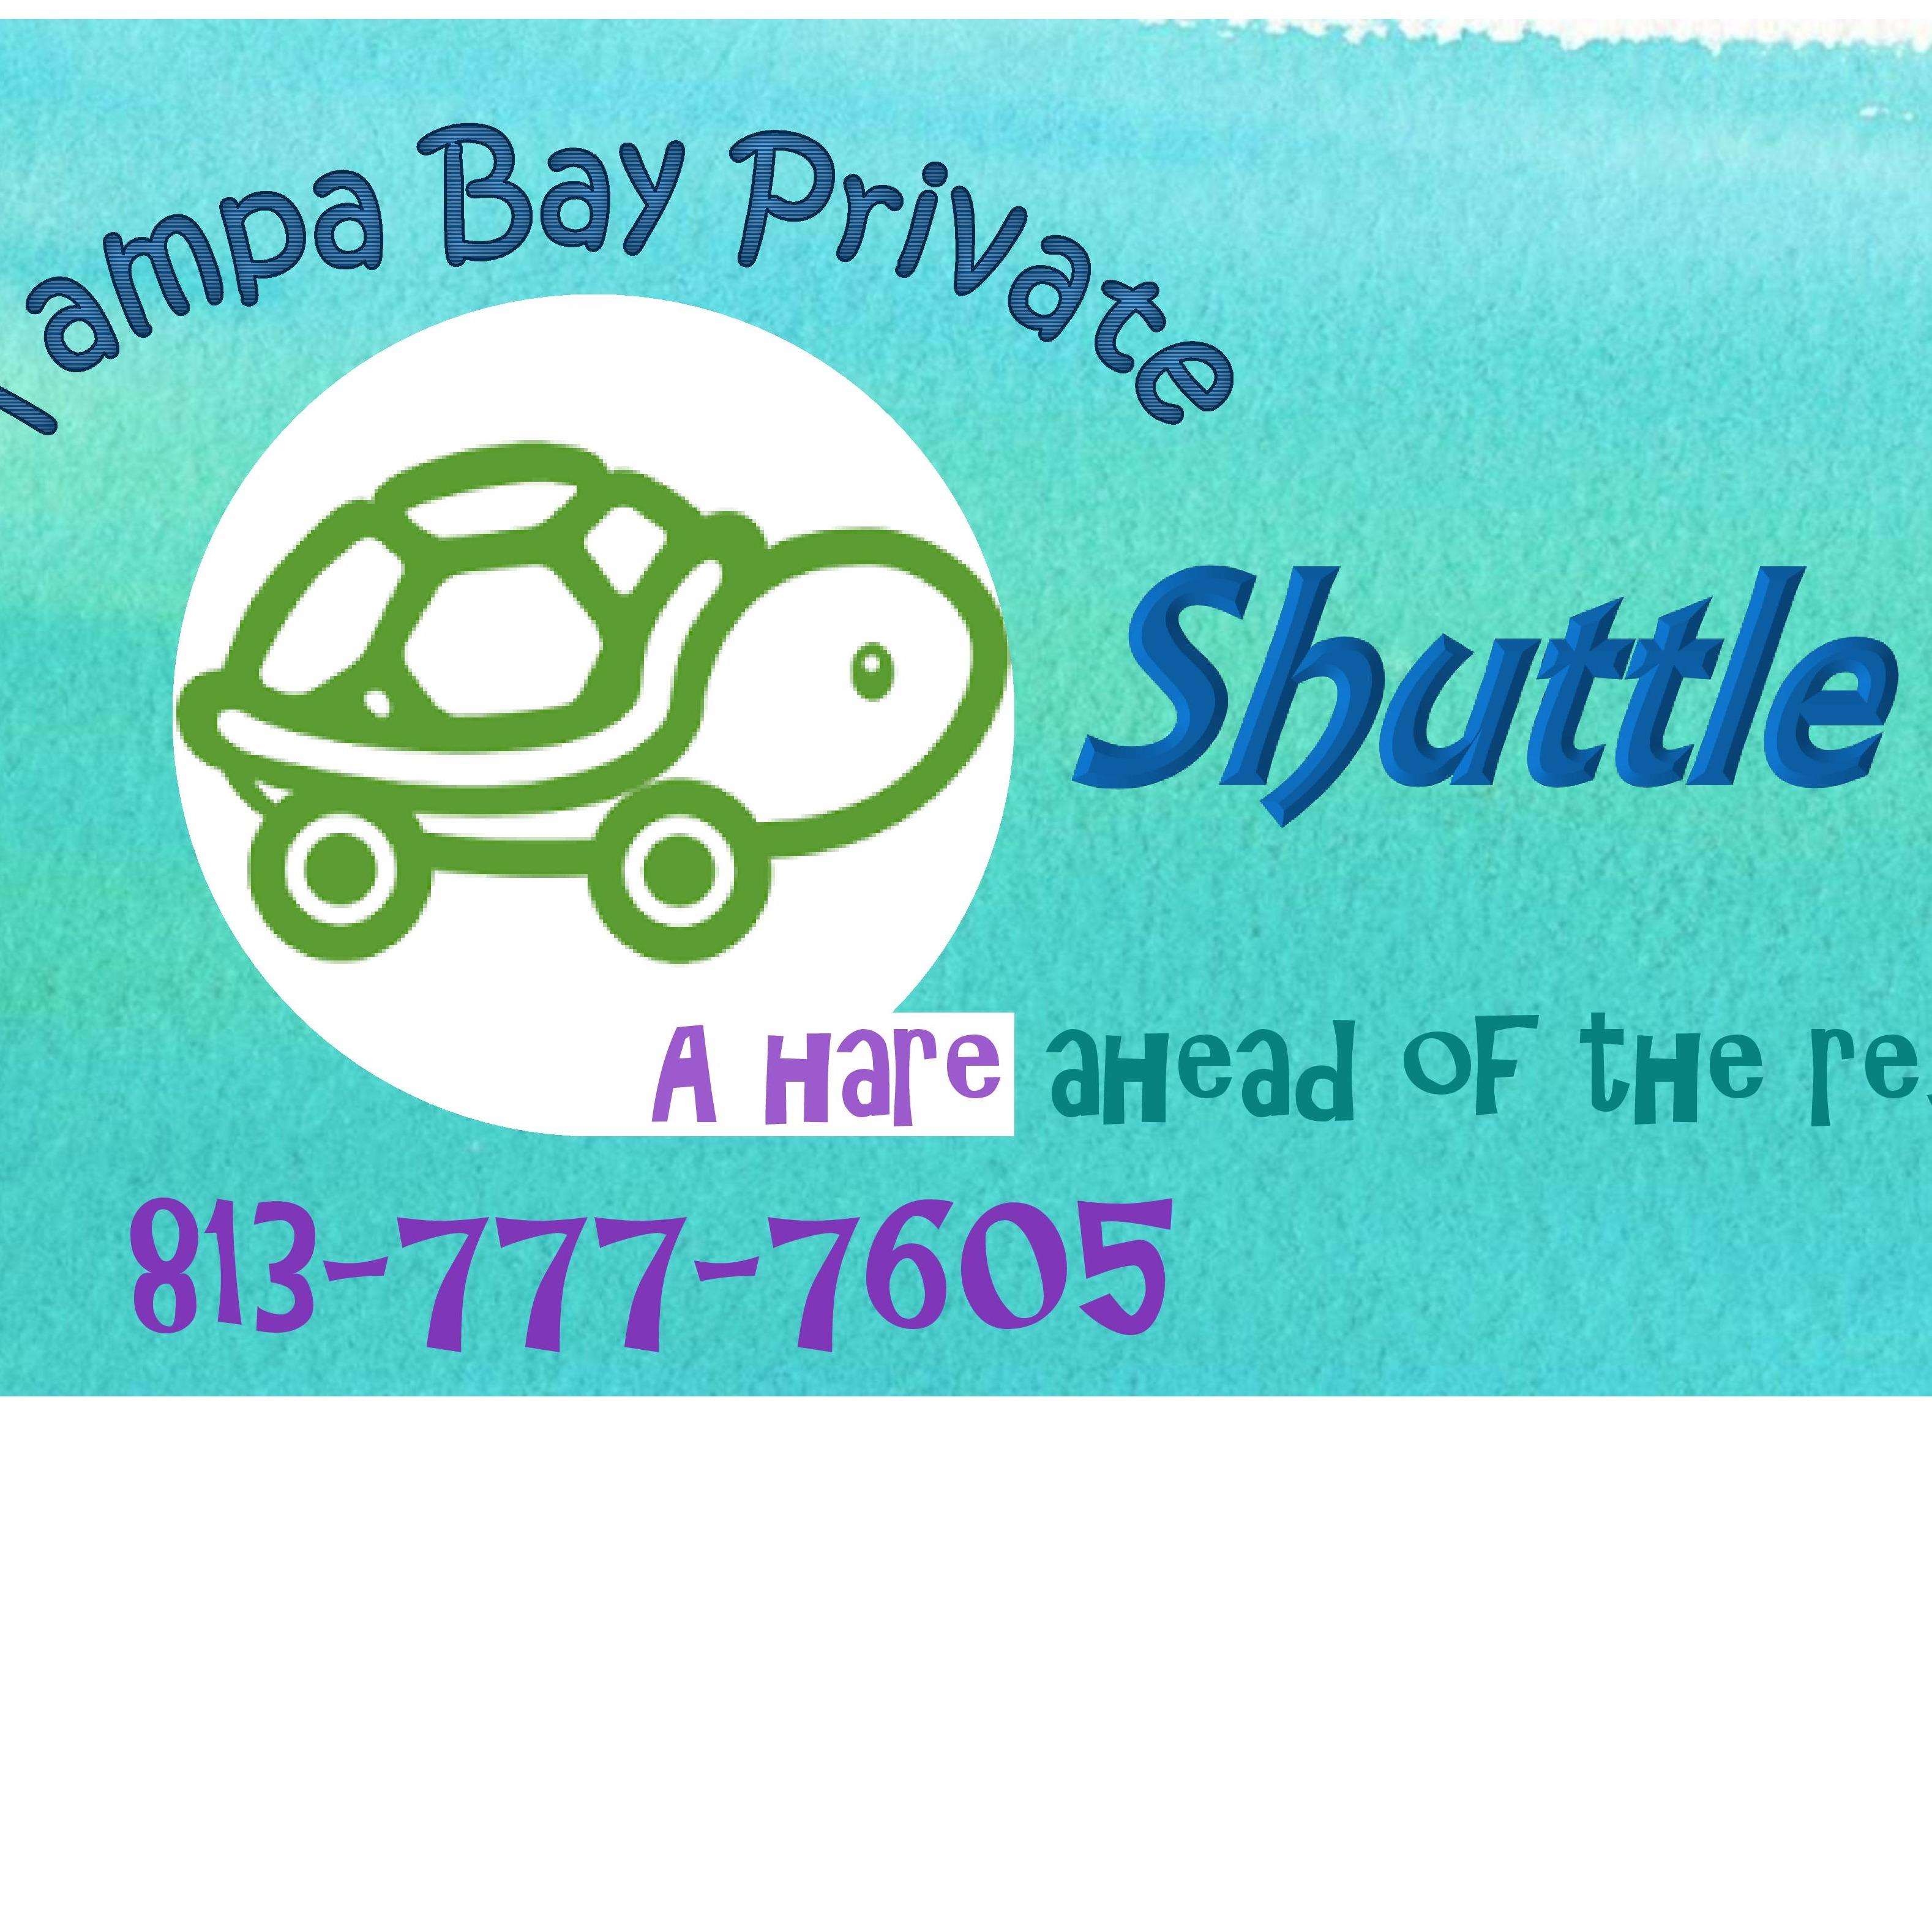 Tampa Bay Private Shuttle